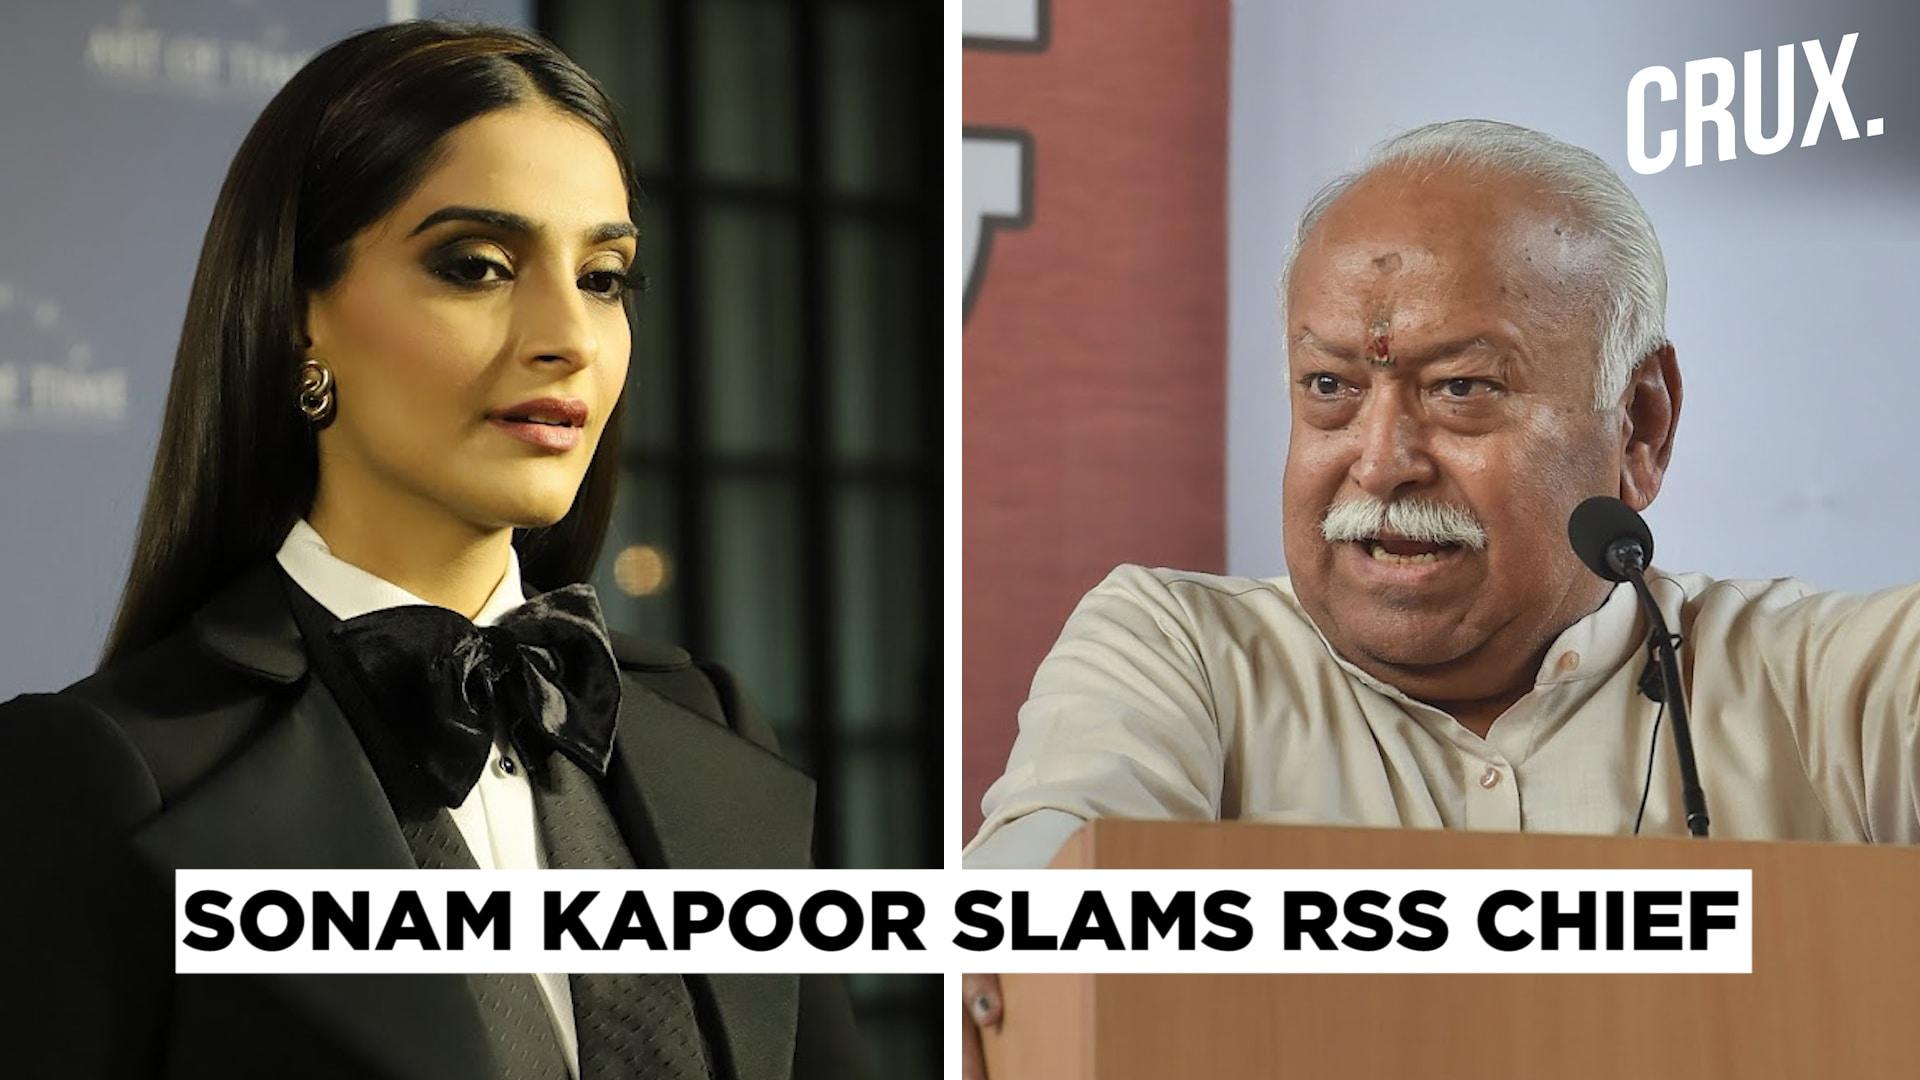 Sonam Kapoor Calls RSS Chief Mohan Bhagwat's Comment on Divorce 'Regressive'